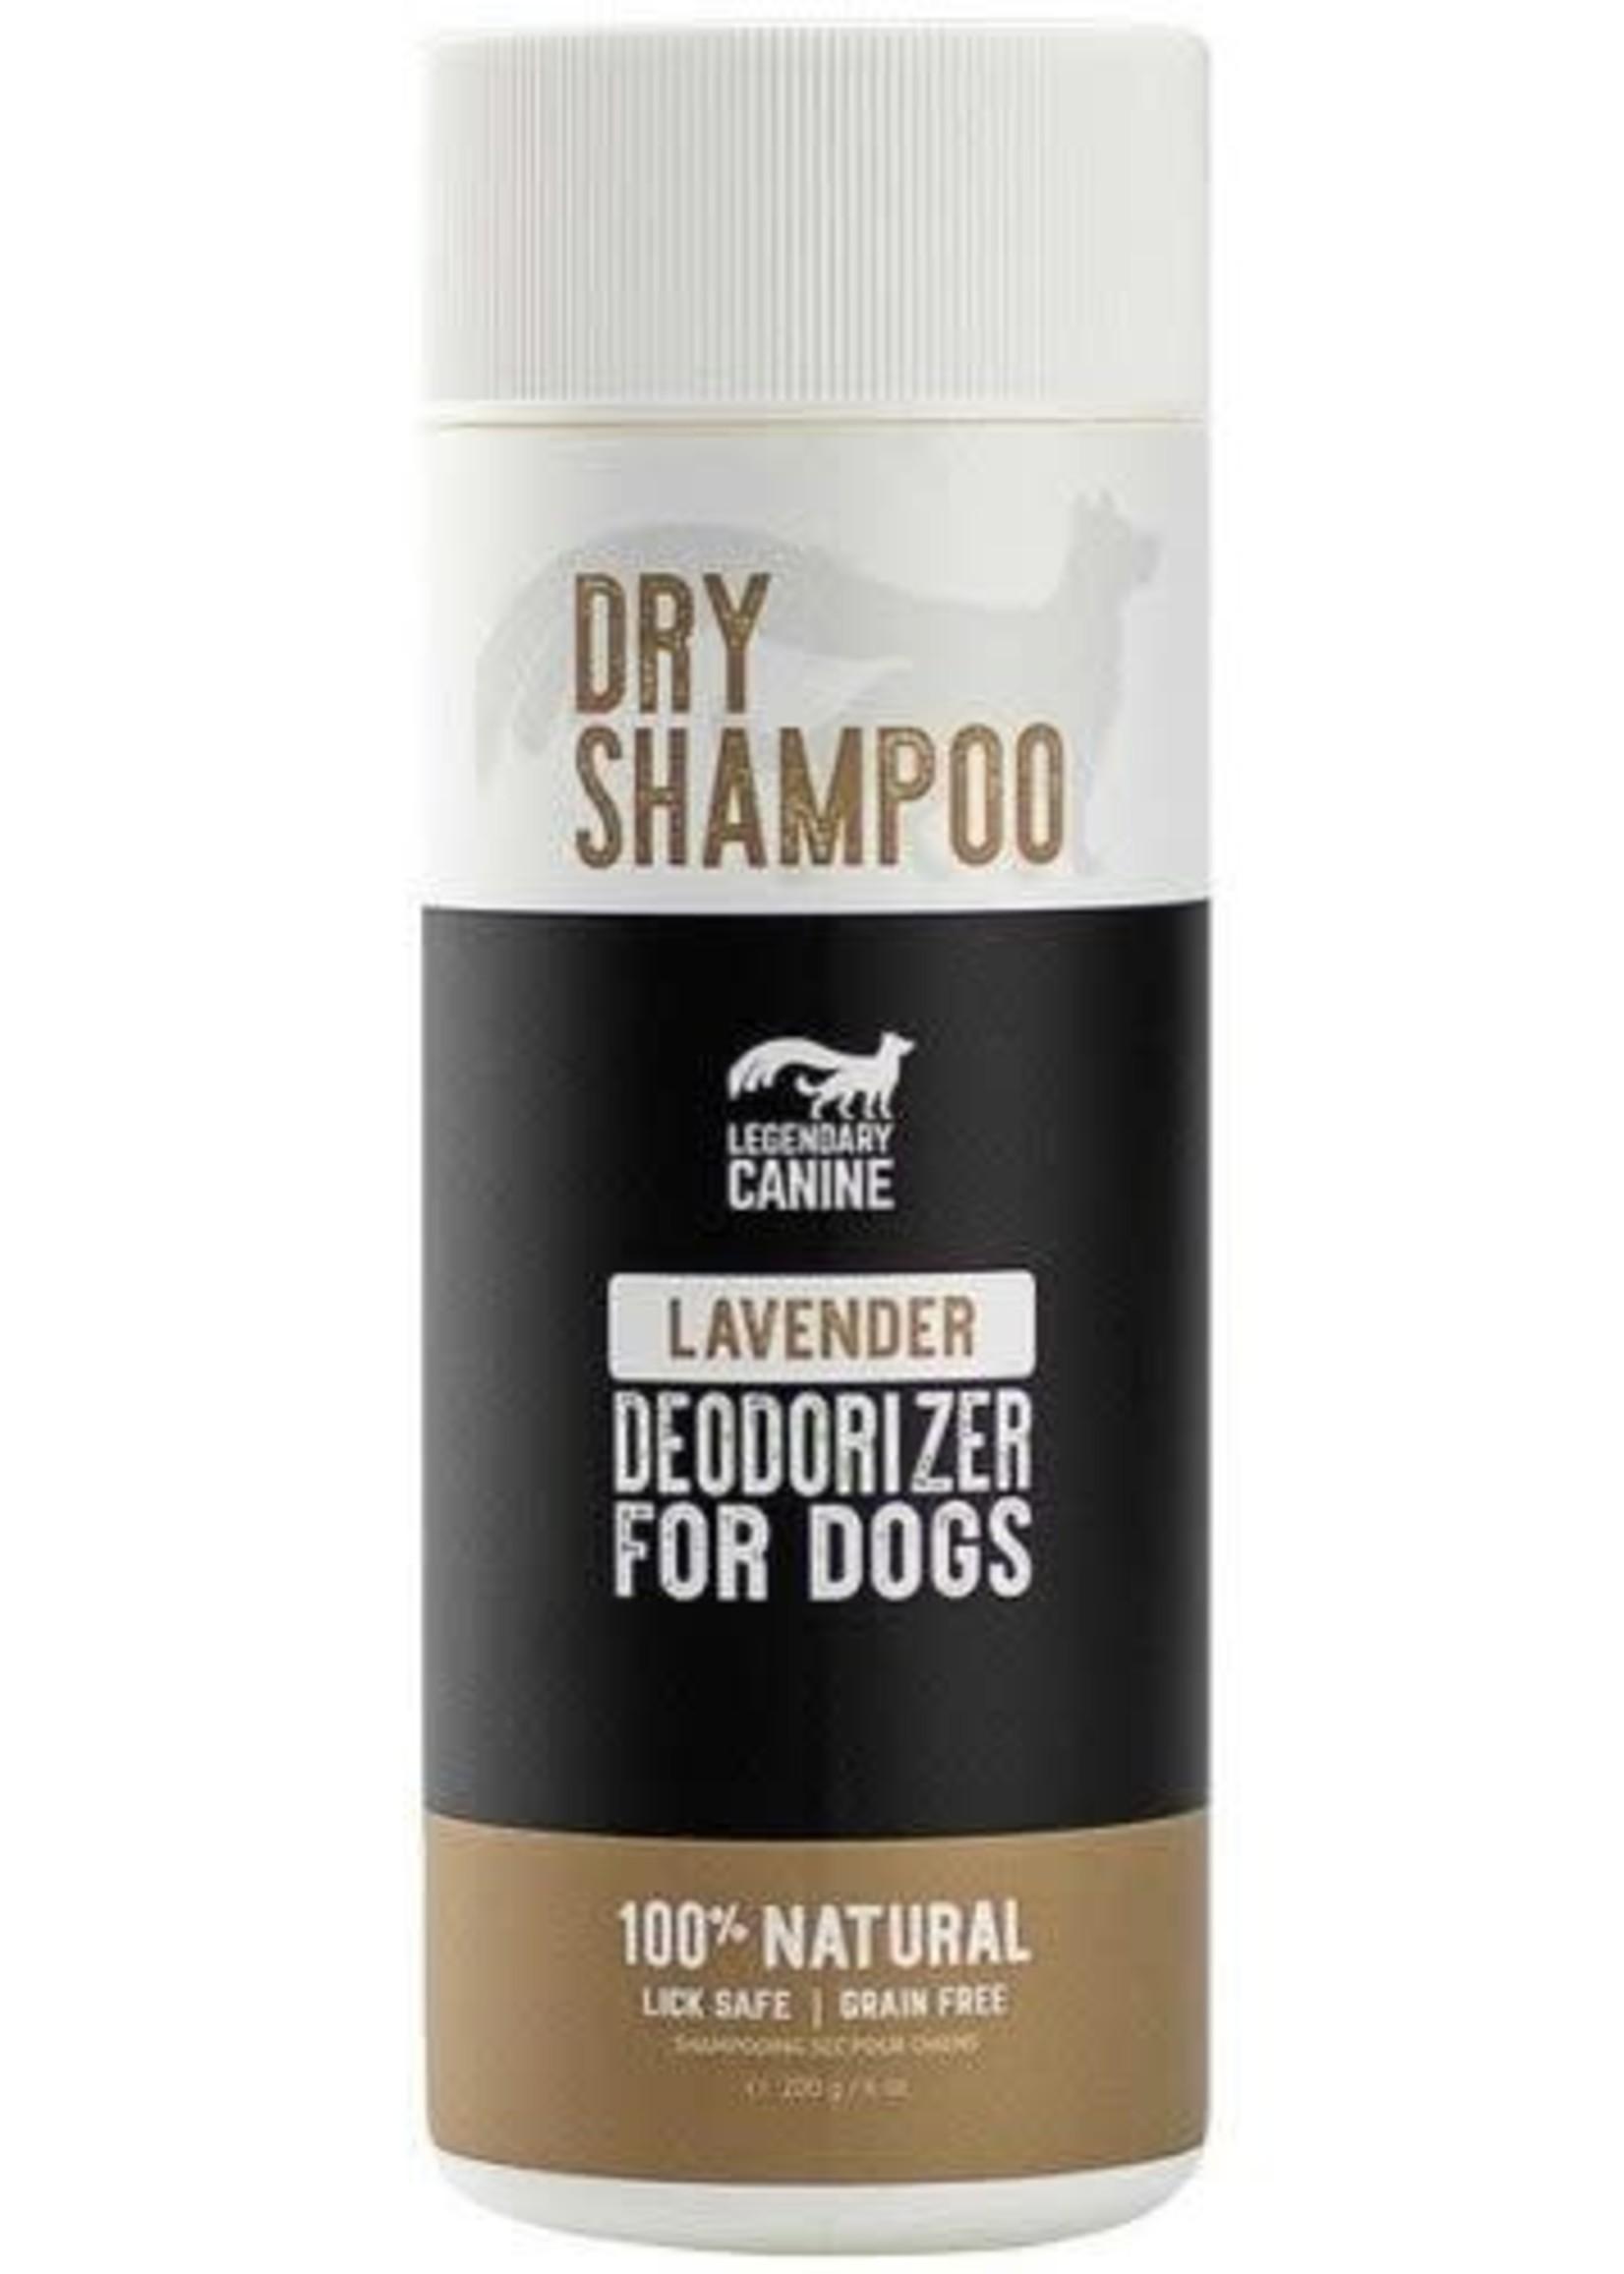 Legendary Canine Legendary Canine Dry Shampoo 250mL